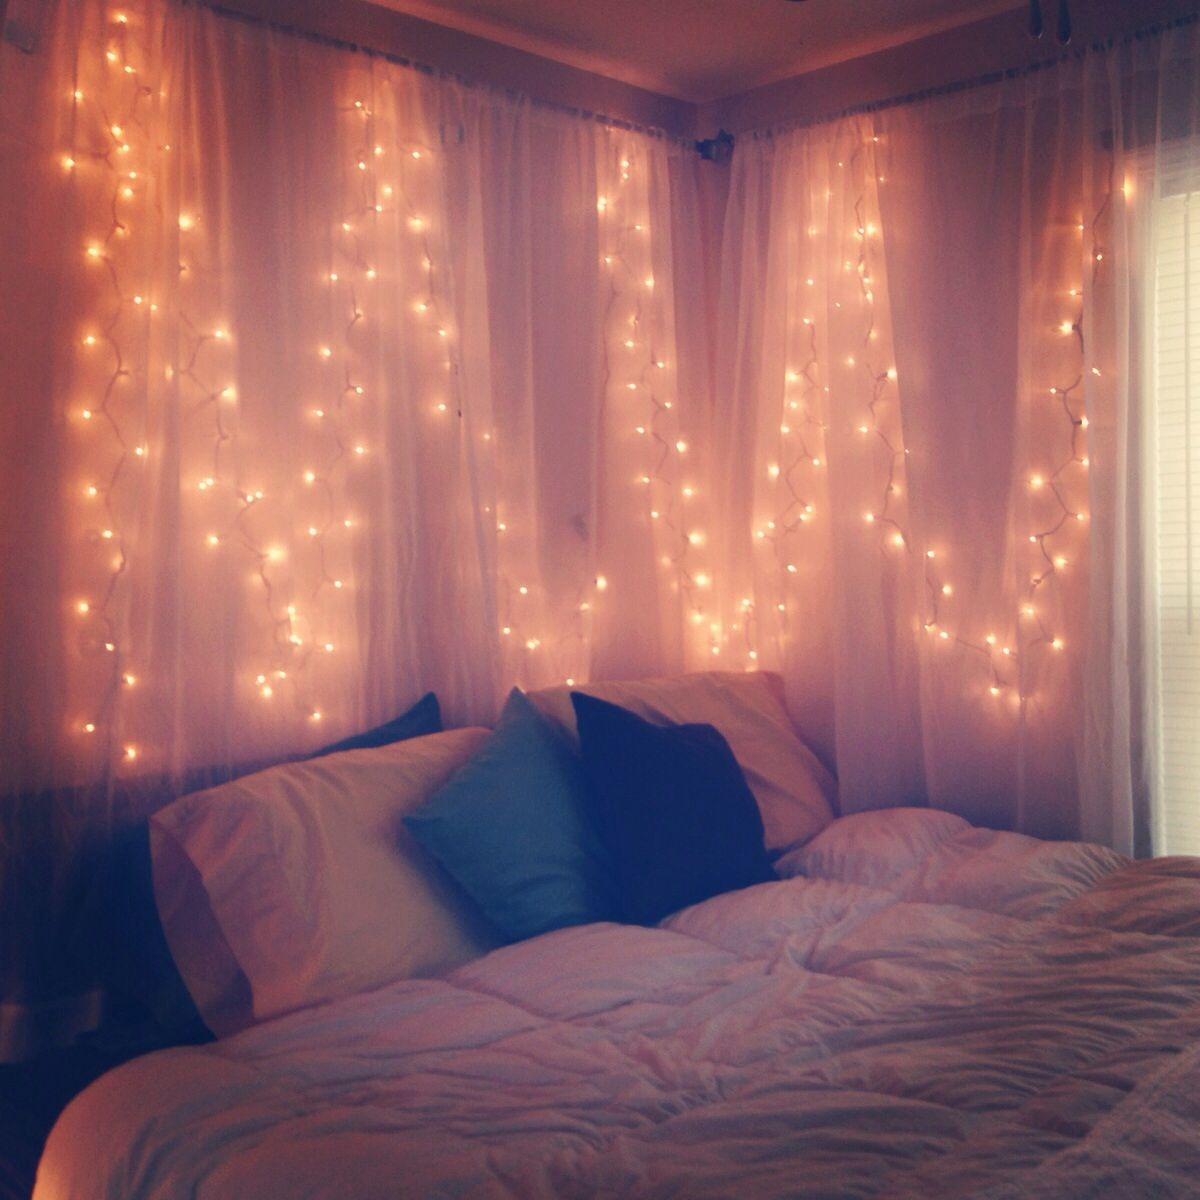 pin by tori anaya on my dream room pinterest dream rooms